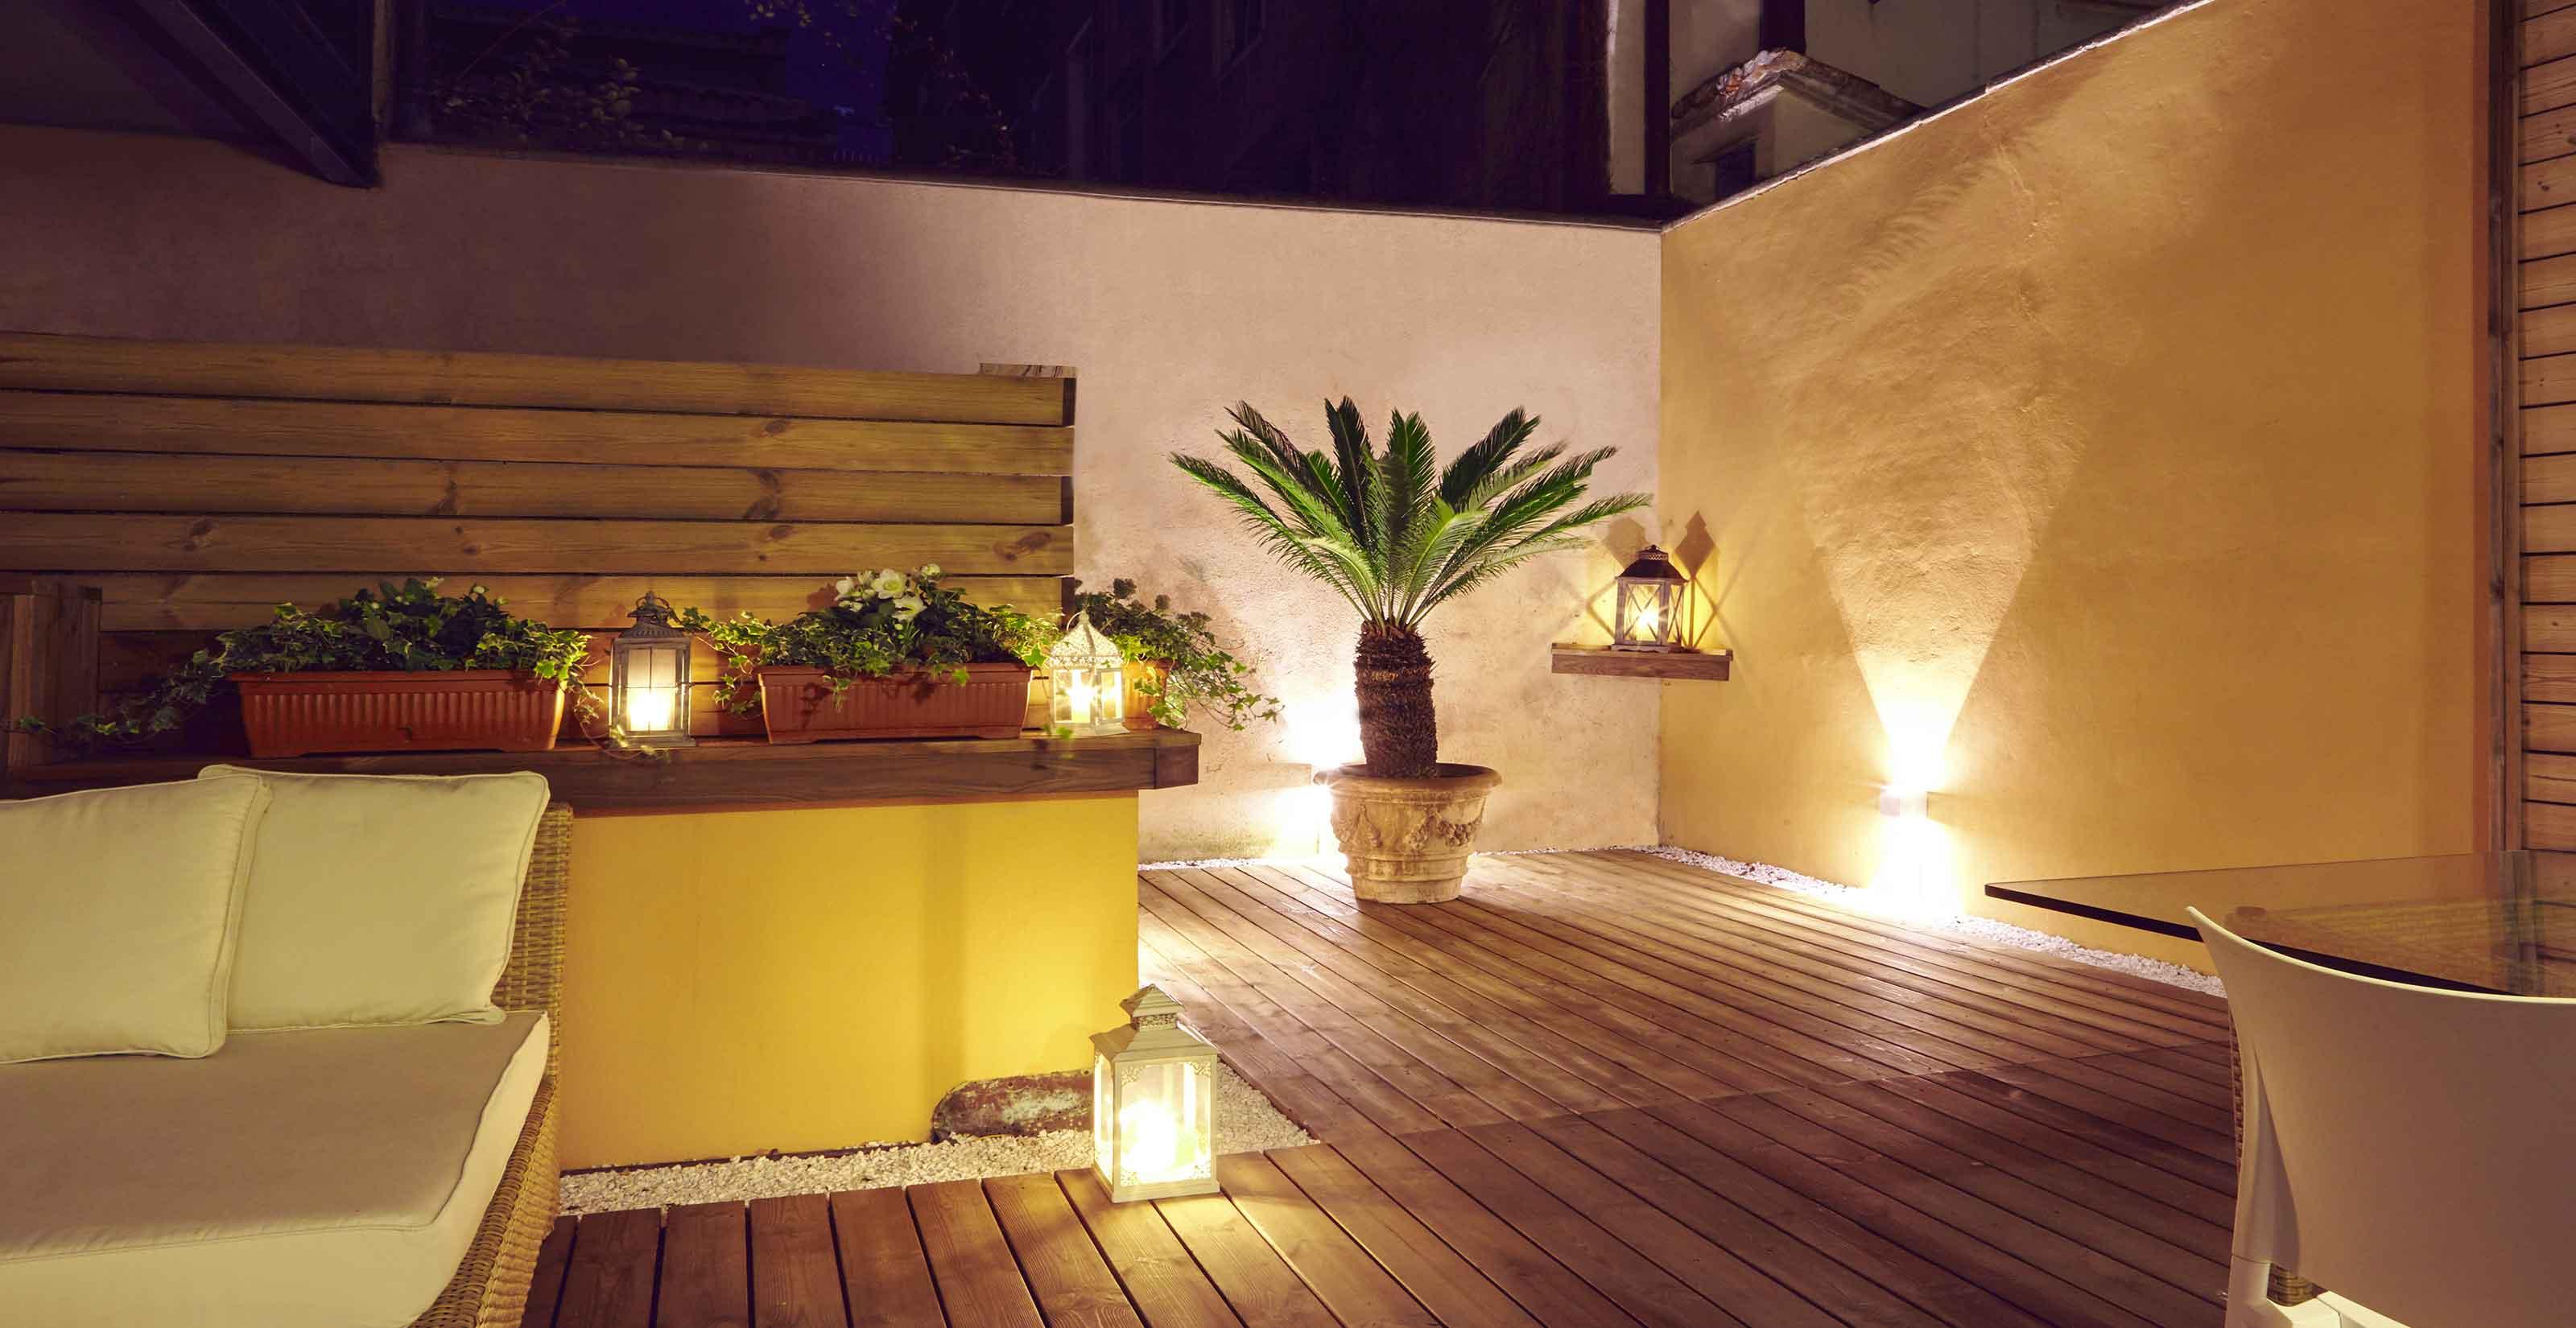 DELUXE SUITE WITH EXCLUSIVE TERRACE 602 - Paruta House Suites Apartments